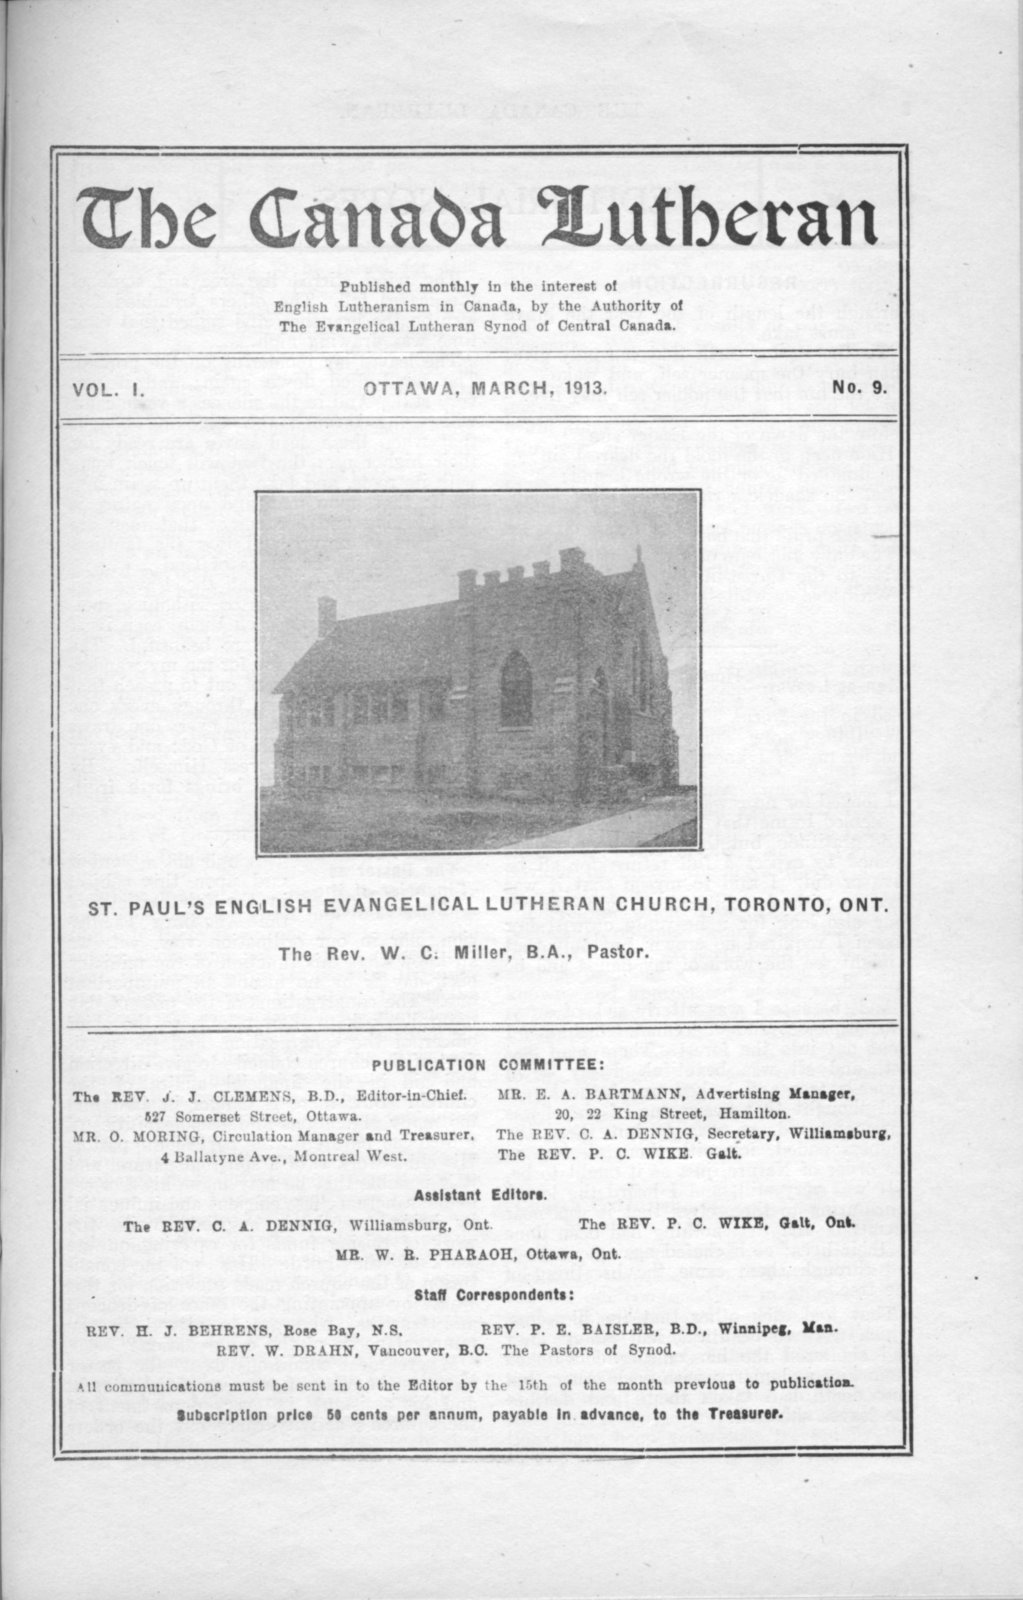 The Canada Lutheran, vol. 1, no. 9, March 1913